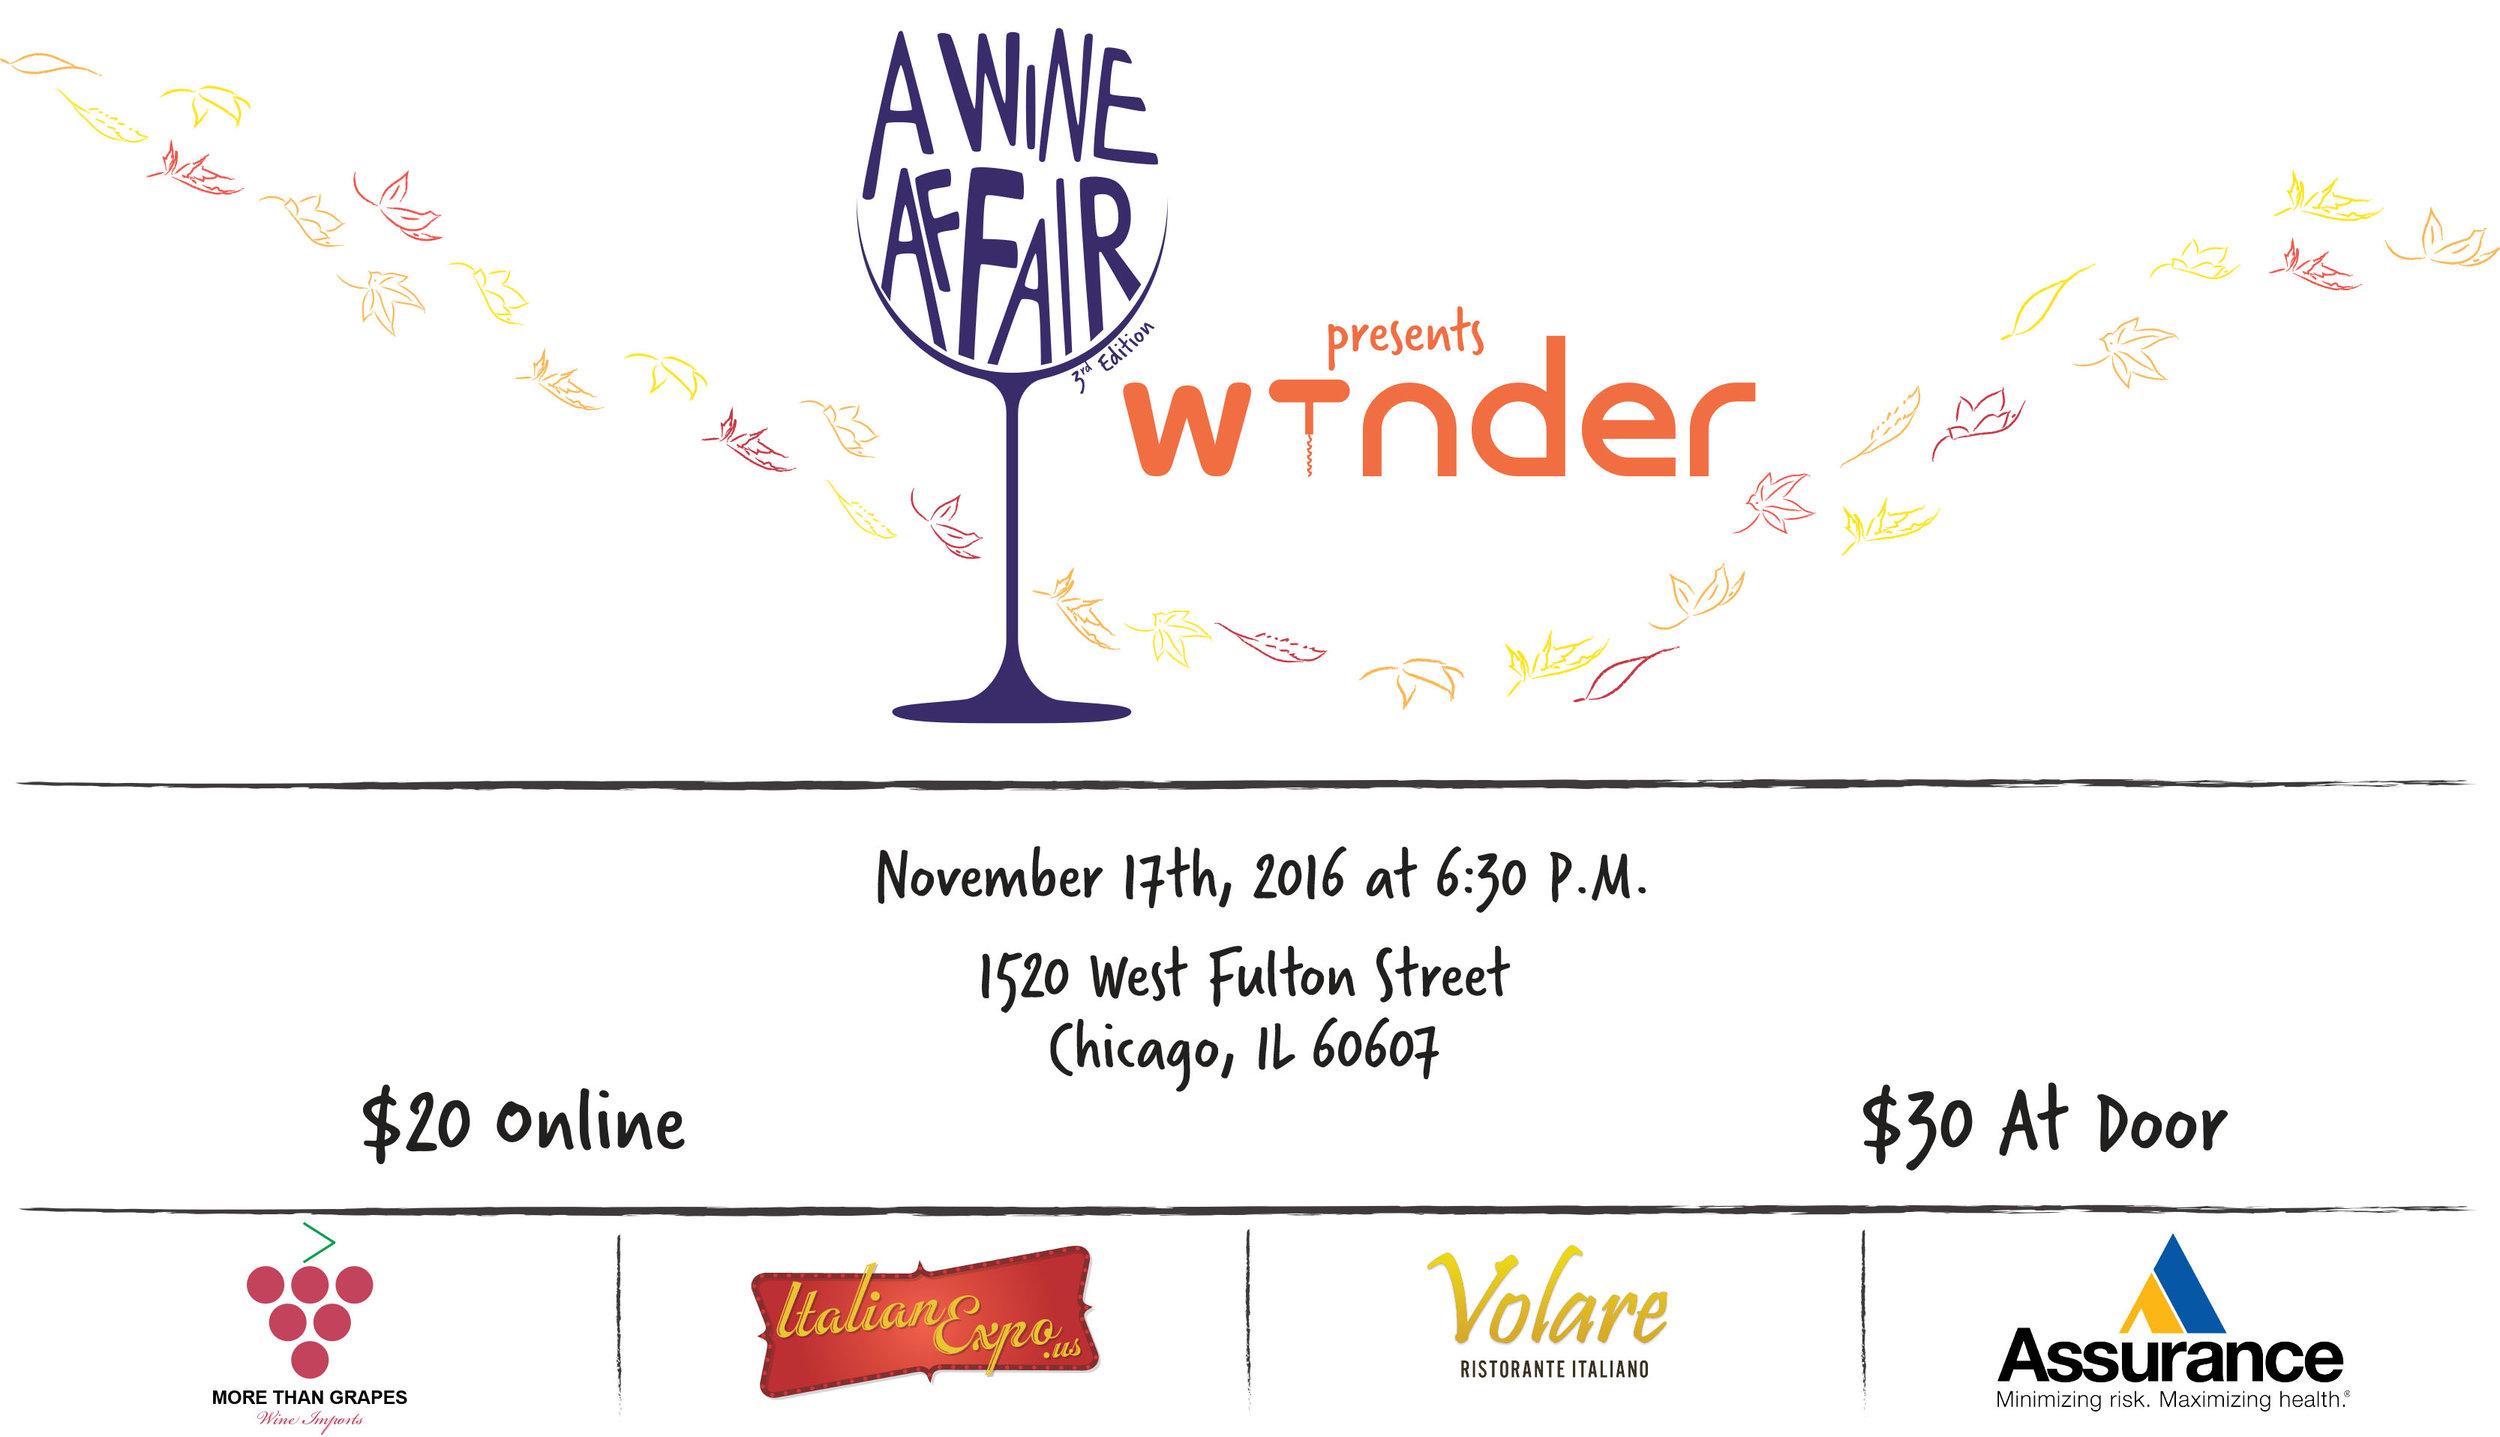 Fall Wine Affair Ticket Image for Website.jpg